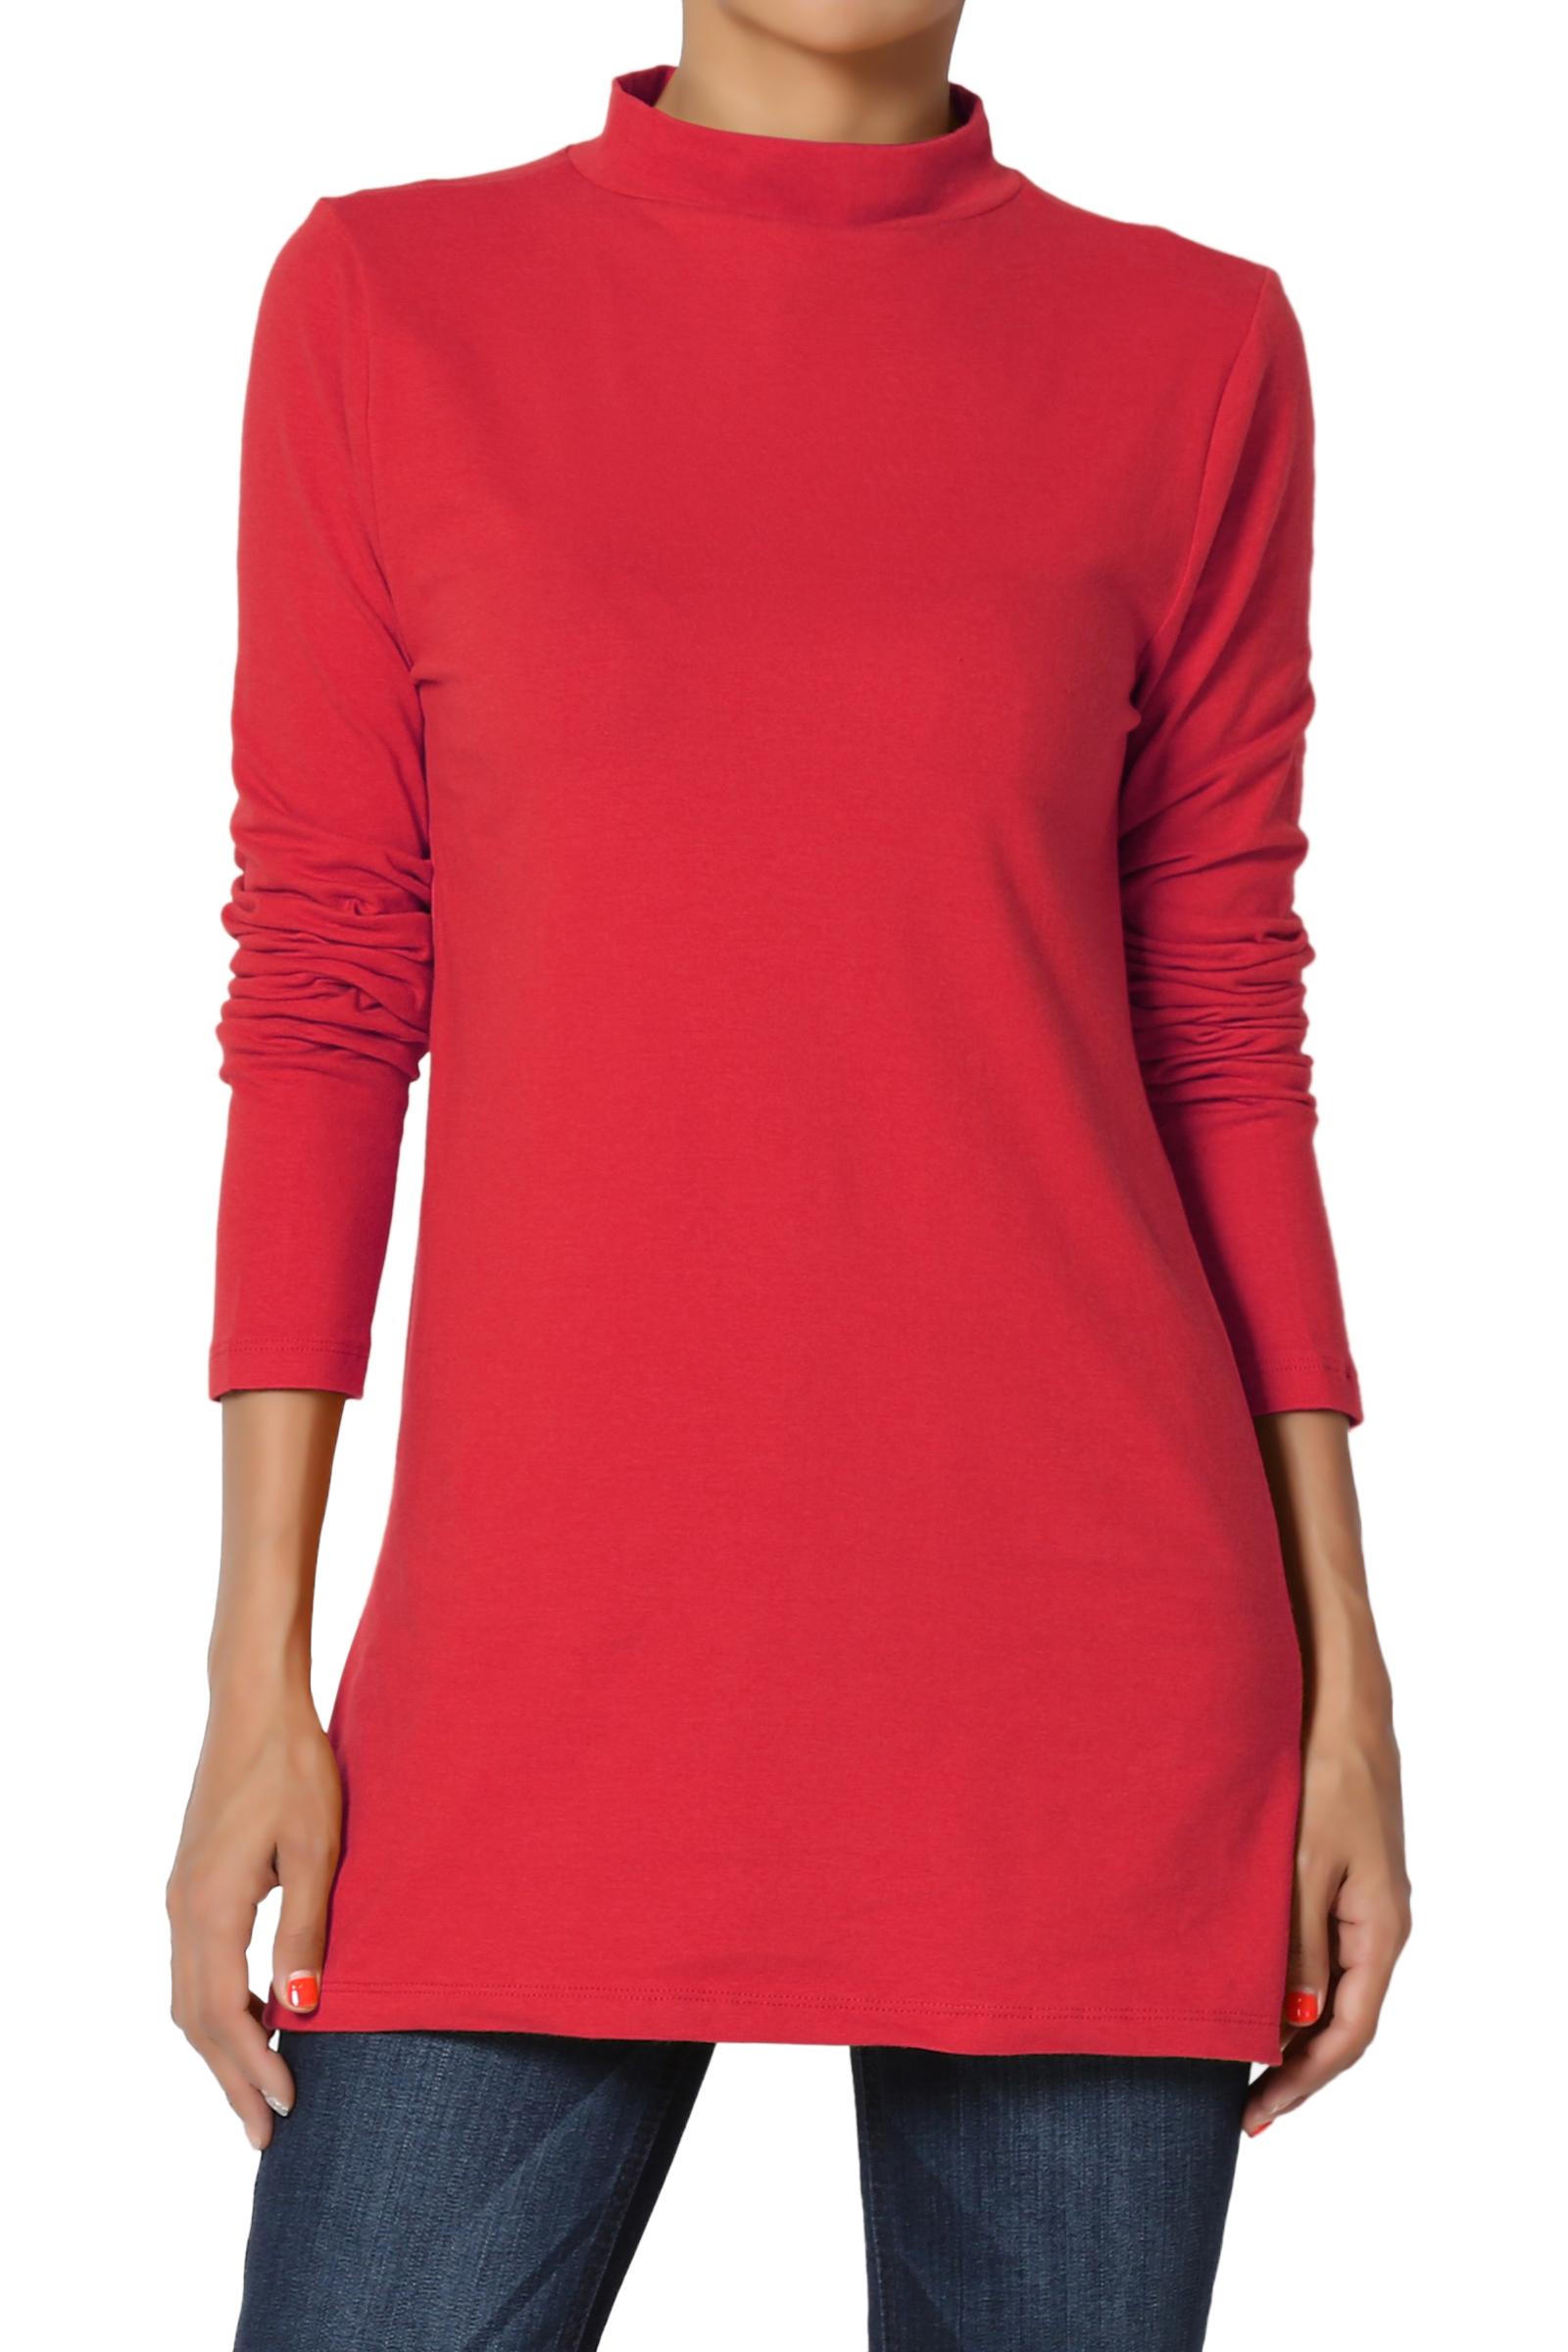 TheMogan Women's PLUS Mock Neck Long Sleeve T-Shirt Stretch Cotton Slim Fit Top